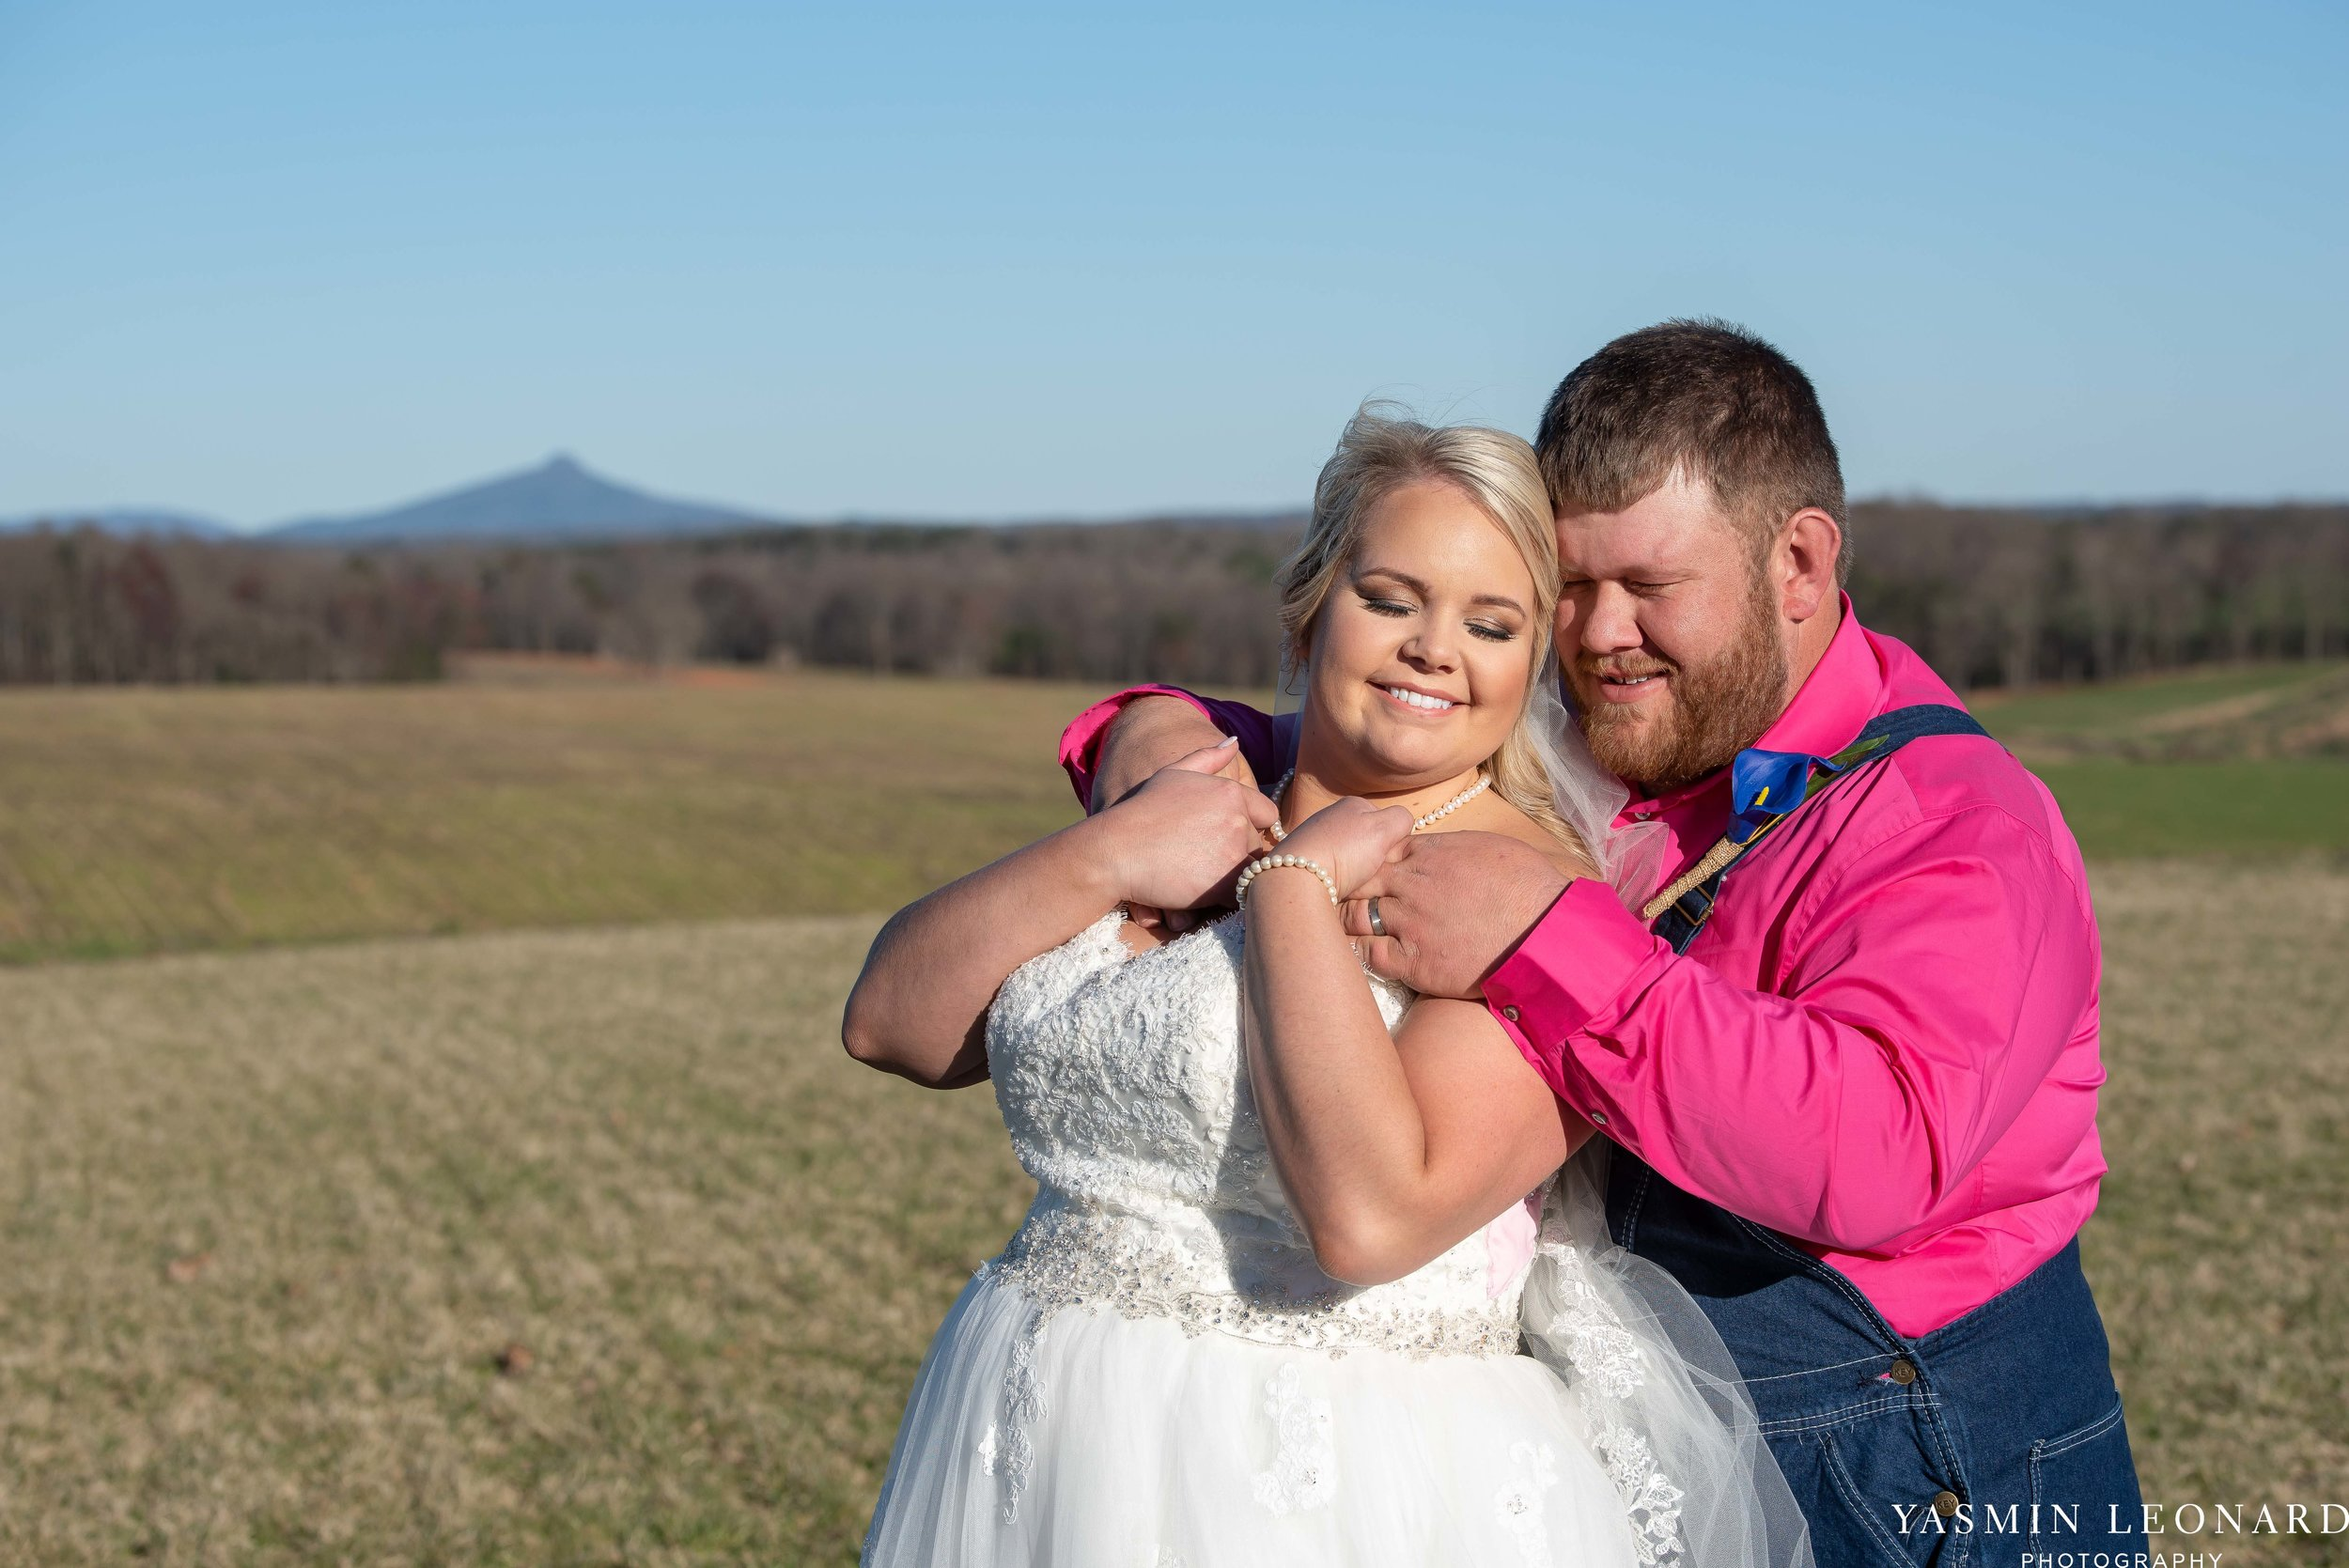 The Barn at Heritage Farm - Country Wedding - Pink and Blue Wedding - Barn Wedding - Outdoor Wedding - Cotton and Wheat Decor - Groom in Bibs - Pink Bridal Colors - Yasmin Leonard Photography-21.jpg